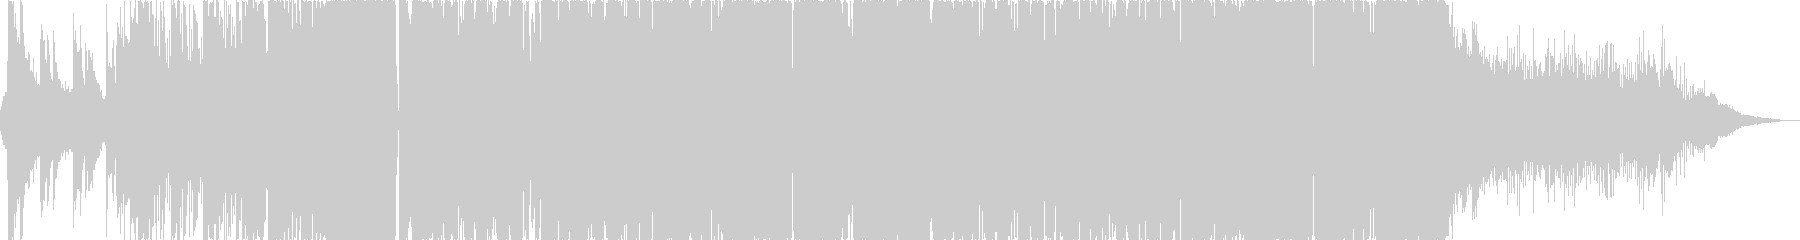 【EDM・ダブステップ】綺麗なメロディーの未再生の波形